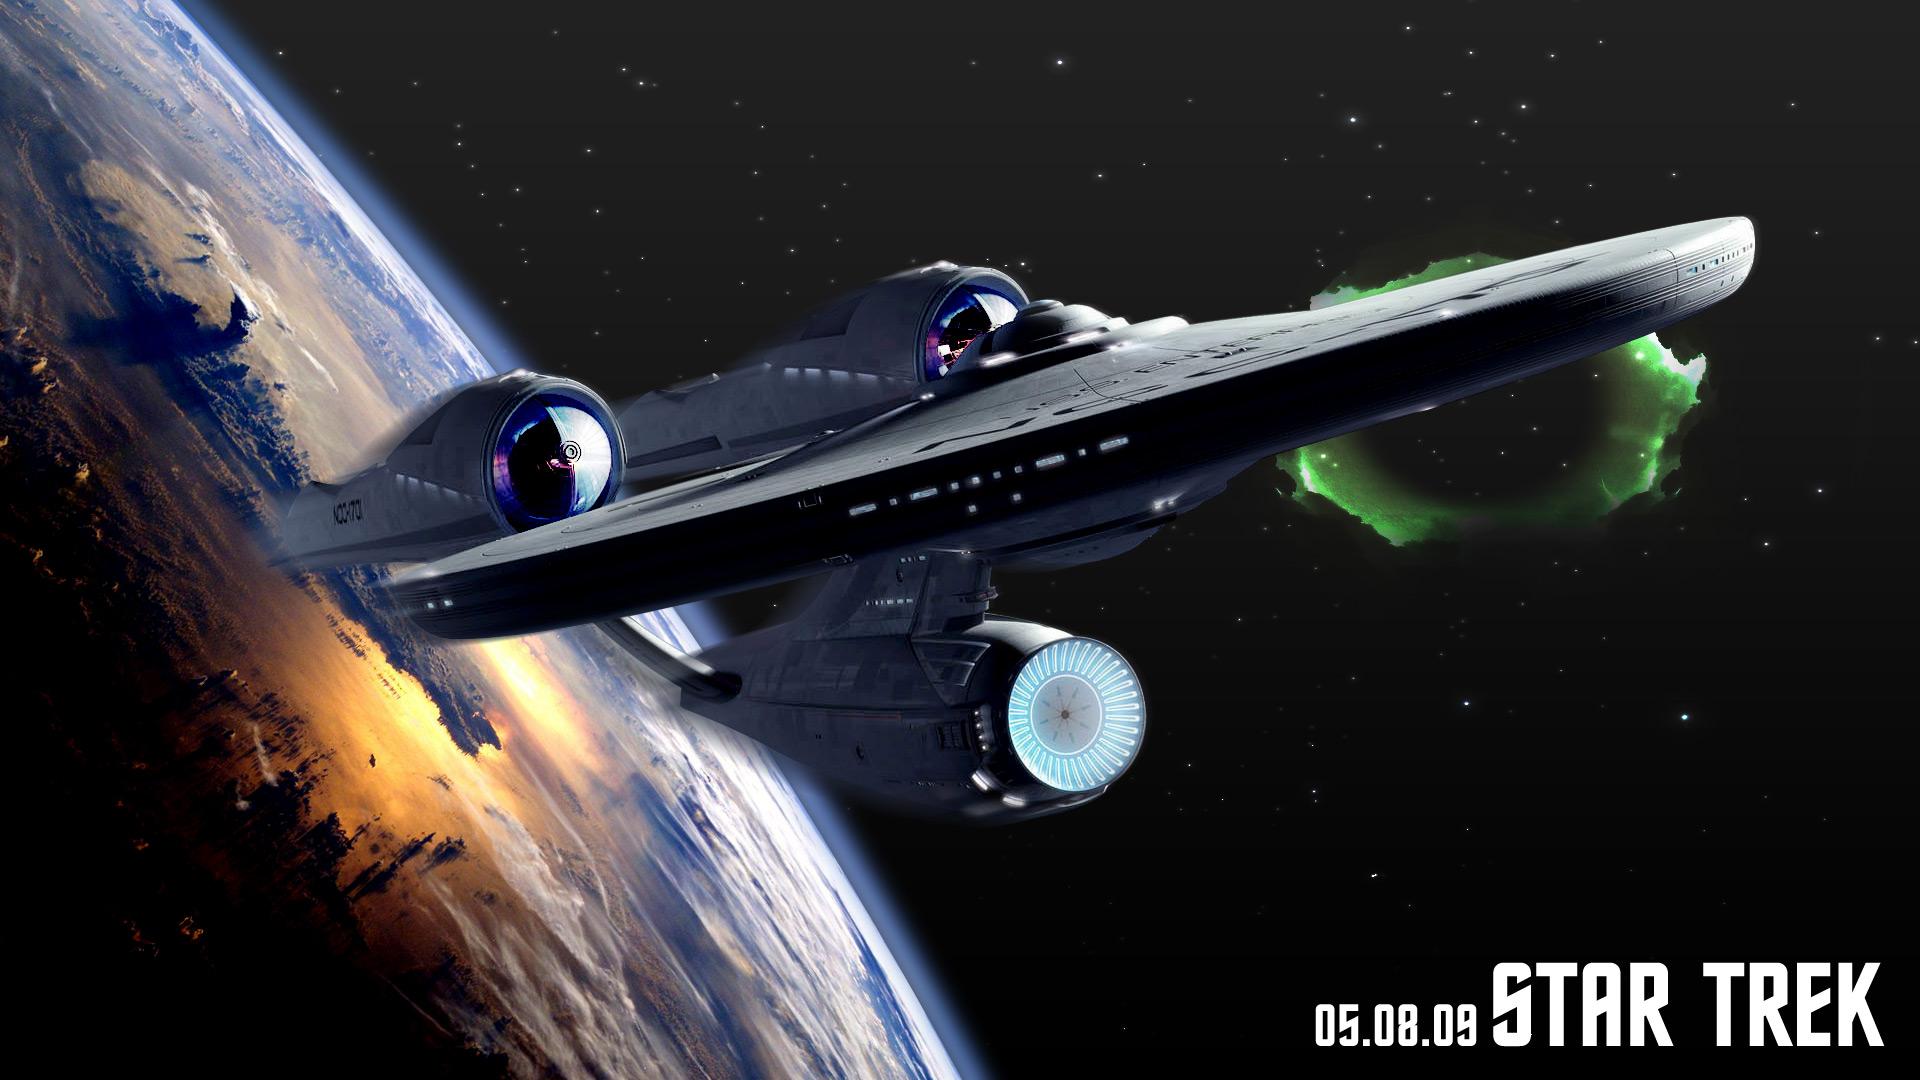 Star Trek Wallpaper HD 1920x1080 ImageBankbiz